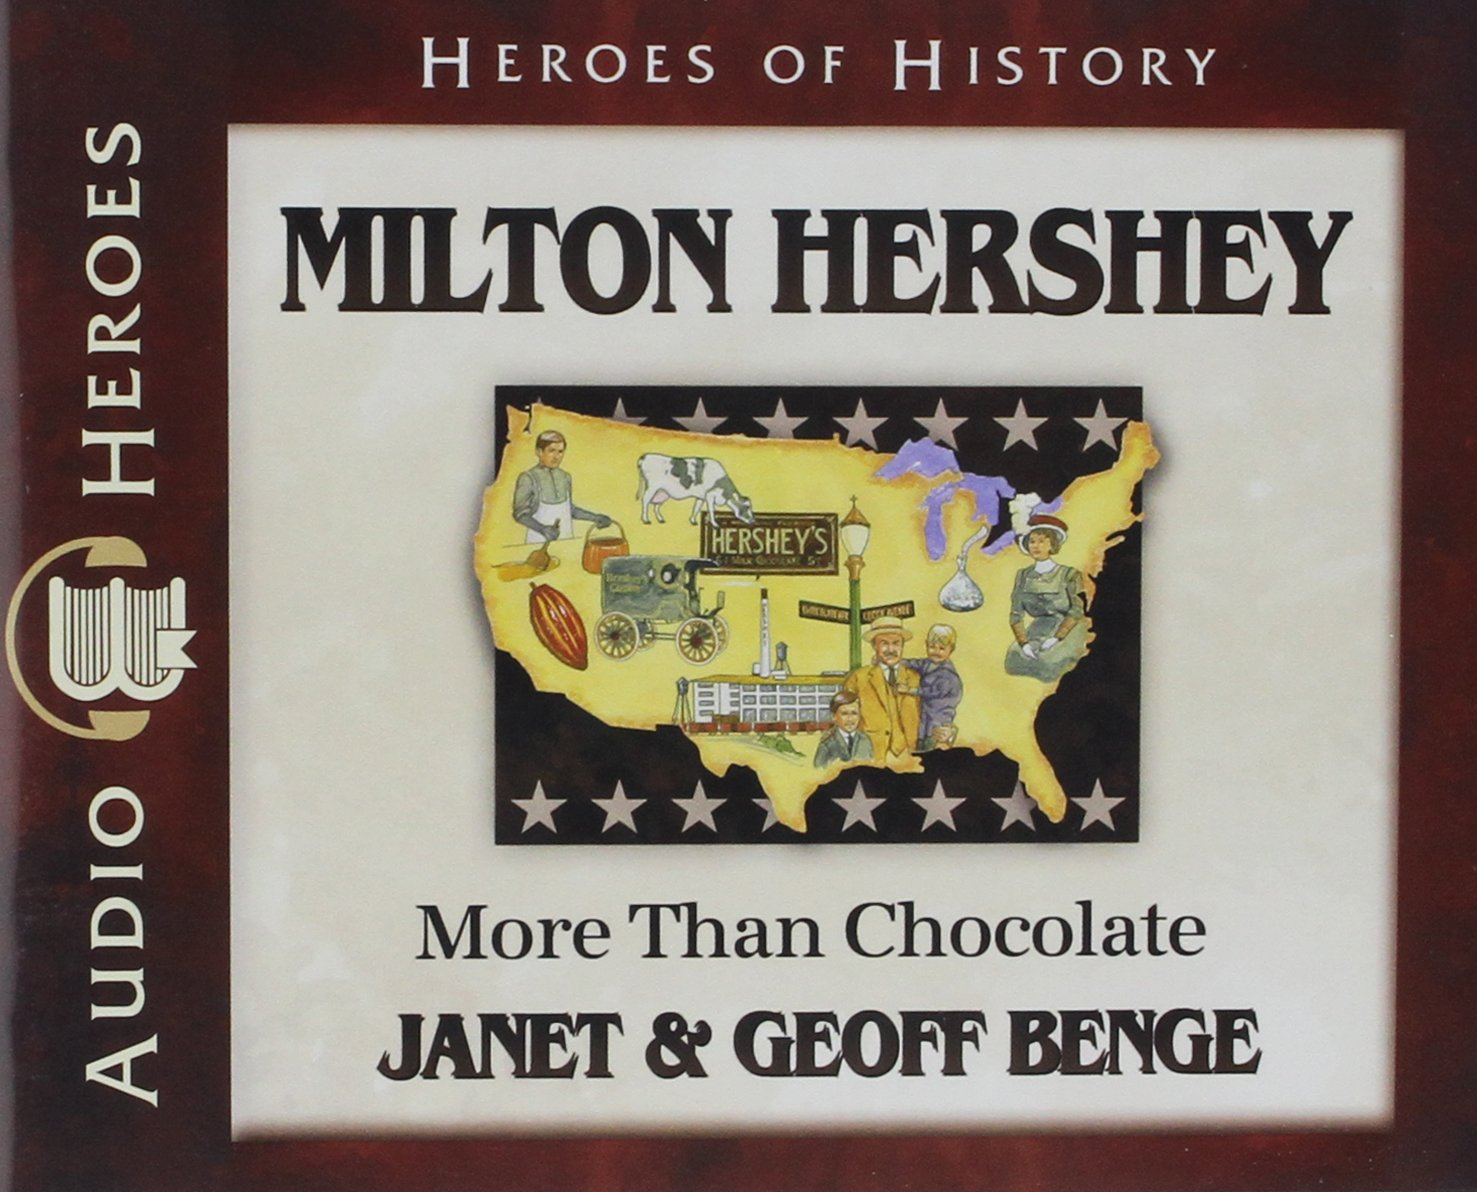 Milton Hershey Audiobook: More Than Chocolate (Heroes of History)